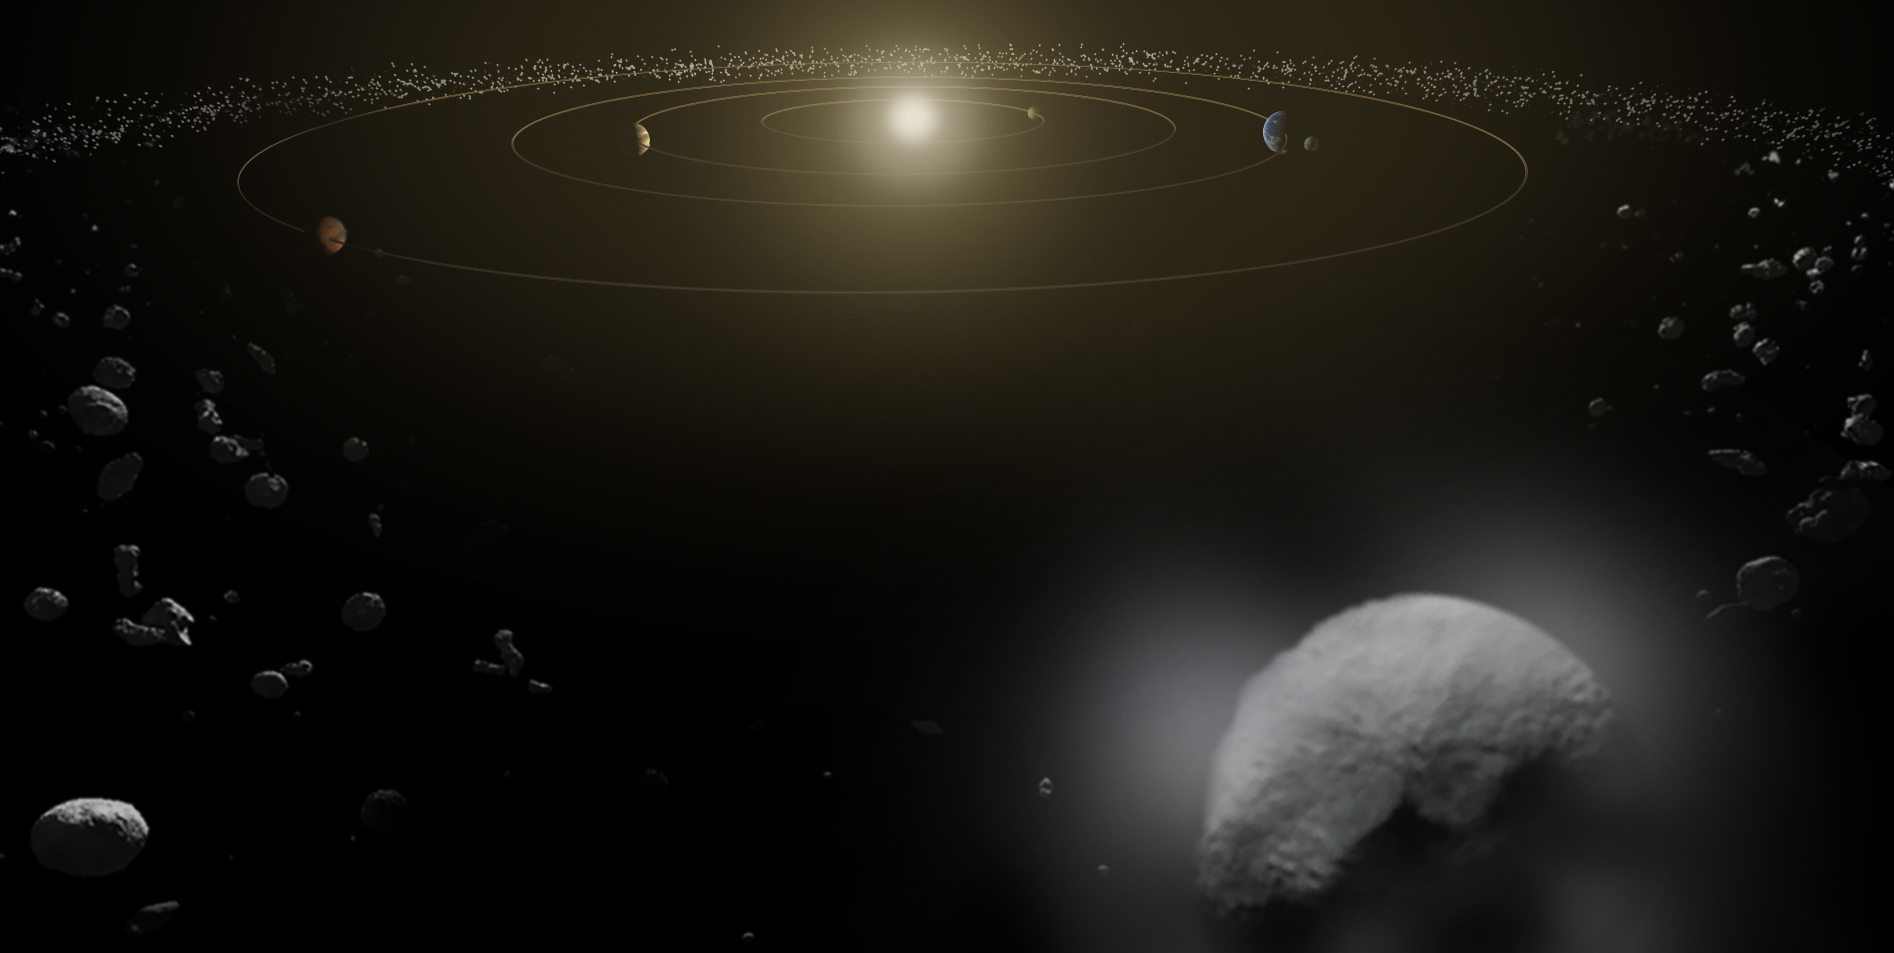 Cena fabryczna niska cena popularna marka Herschel Telescope Detects Water on Dwarf Planet | NASA